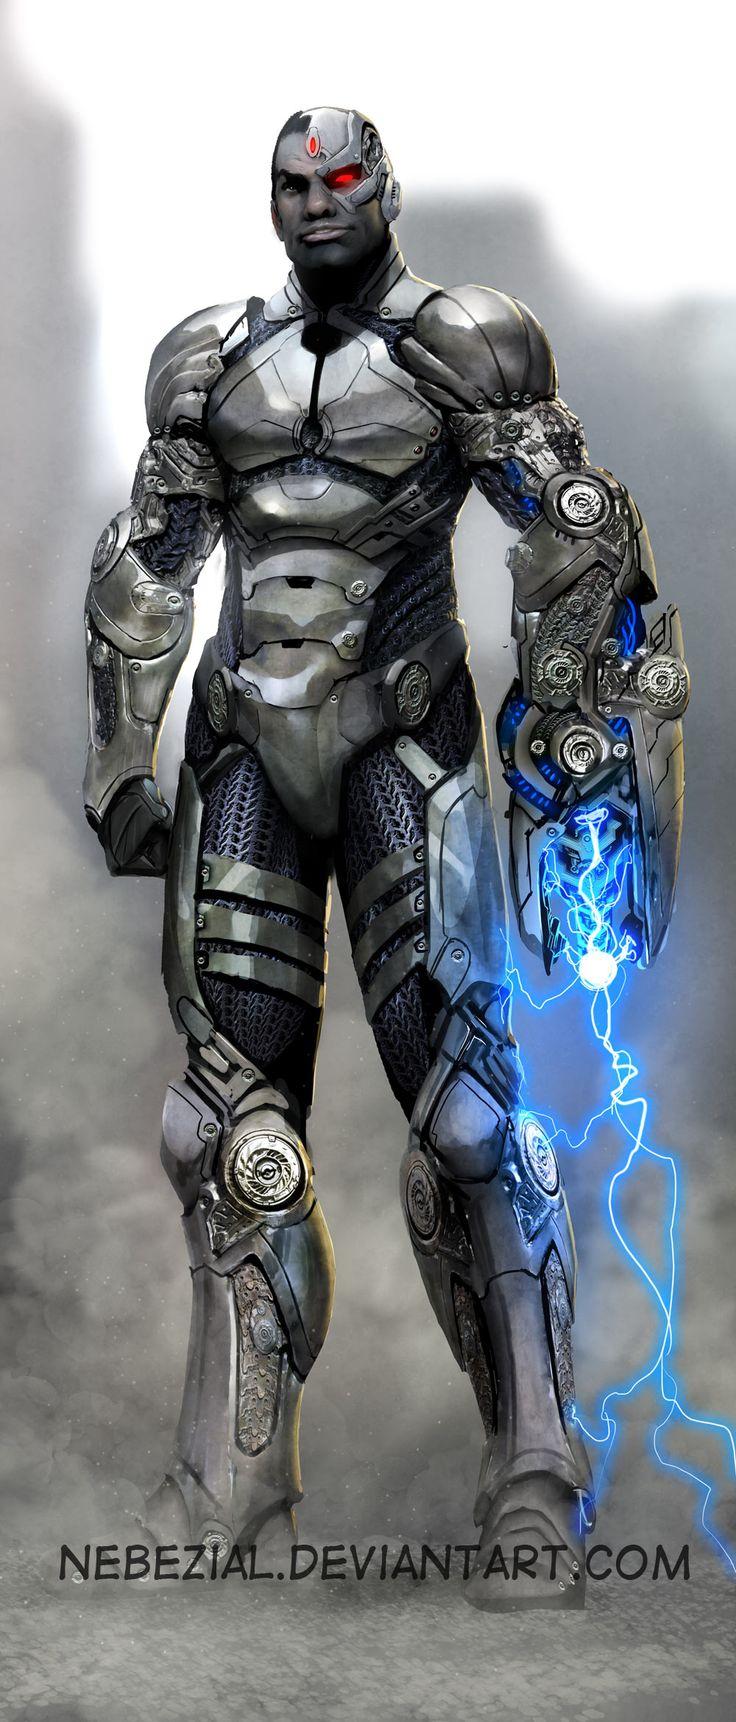 omg he is soooo metal! by nebezial.deviantart.com on @deviantART